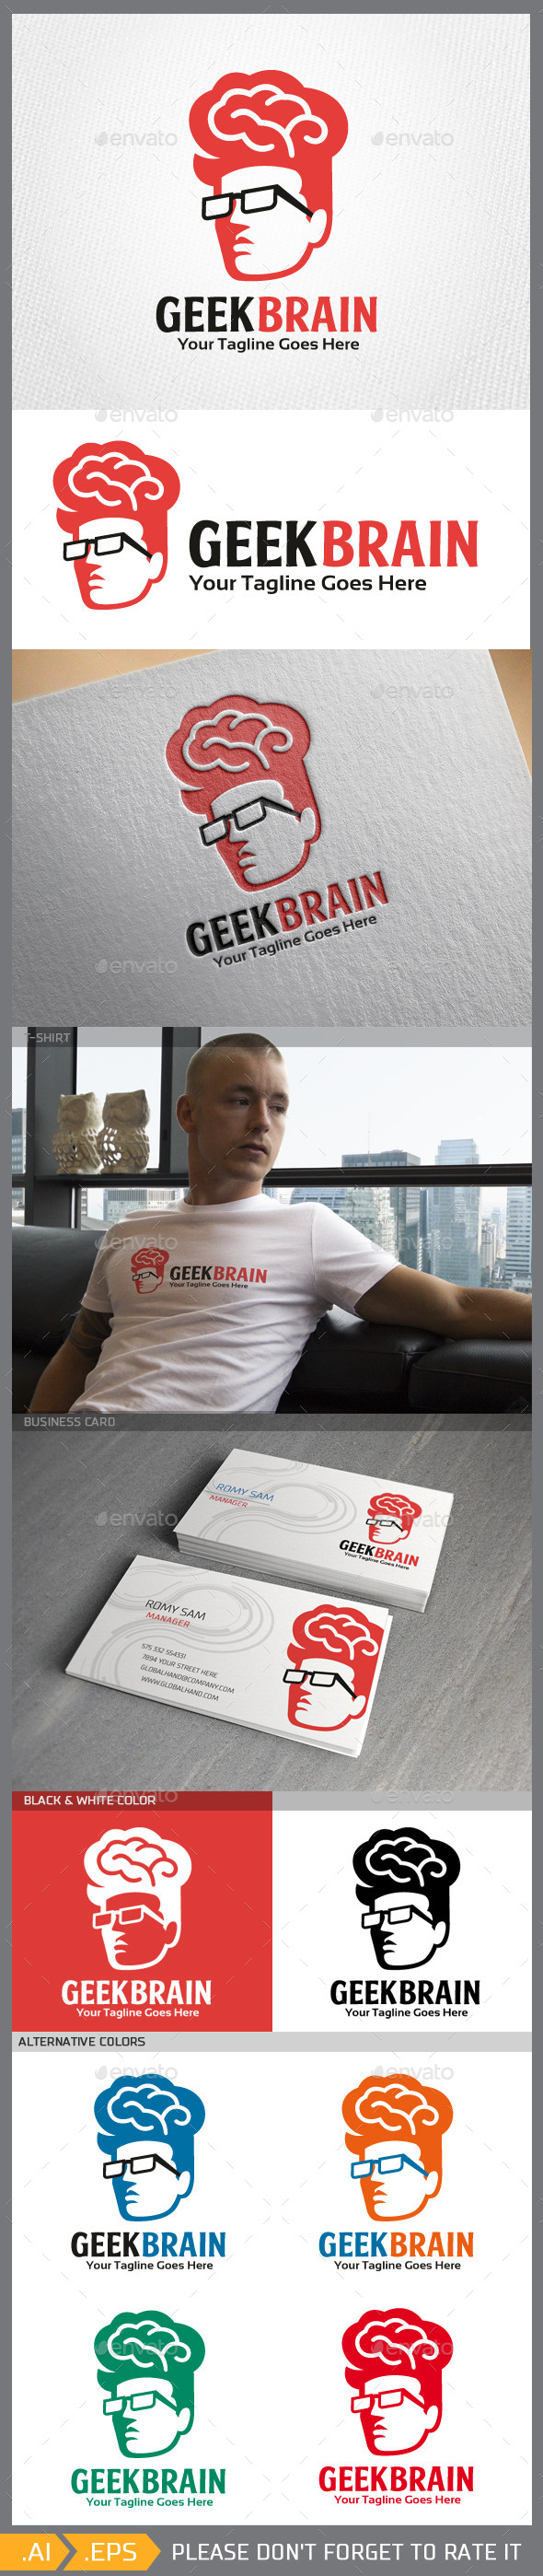 GraphicRiver Geekbrain Logo Template 10379018